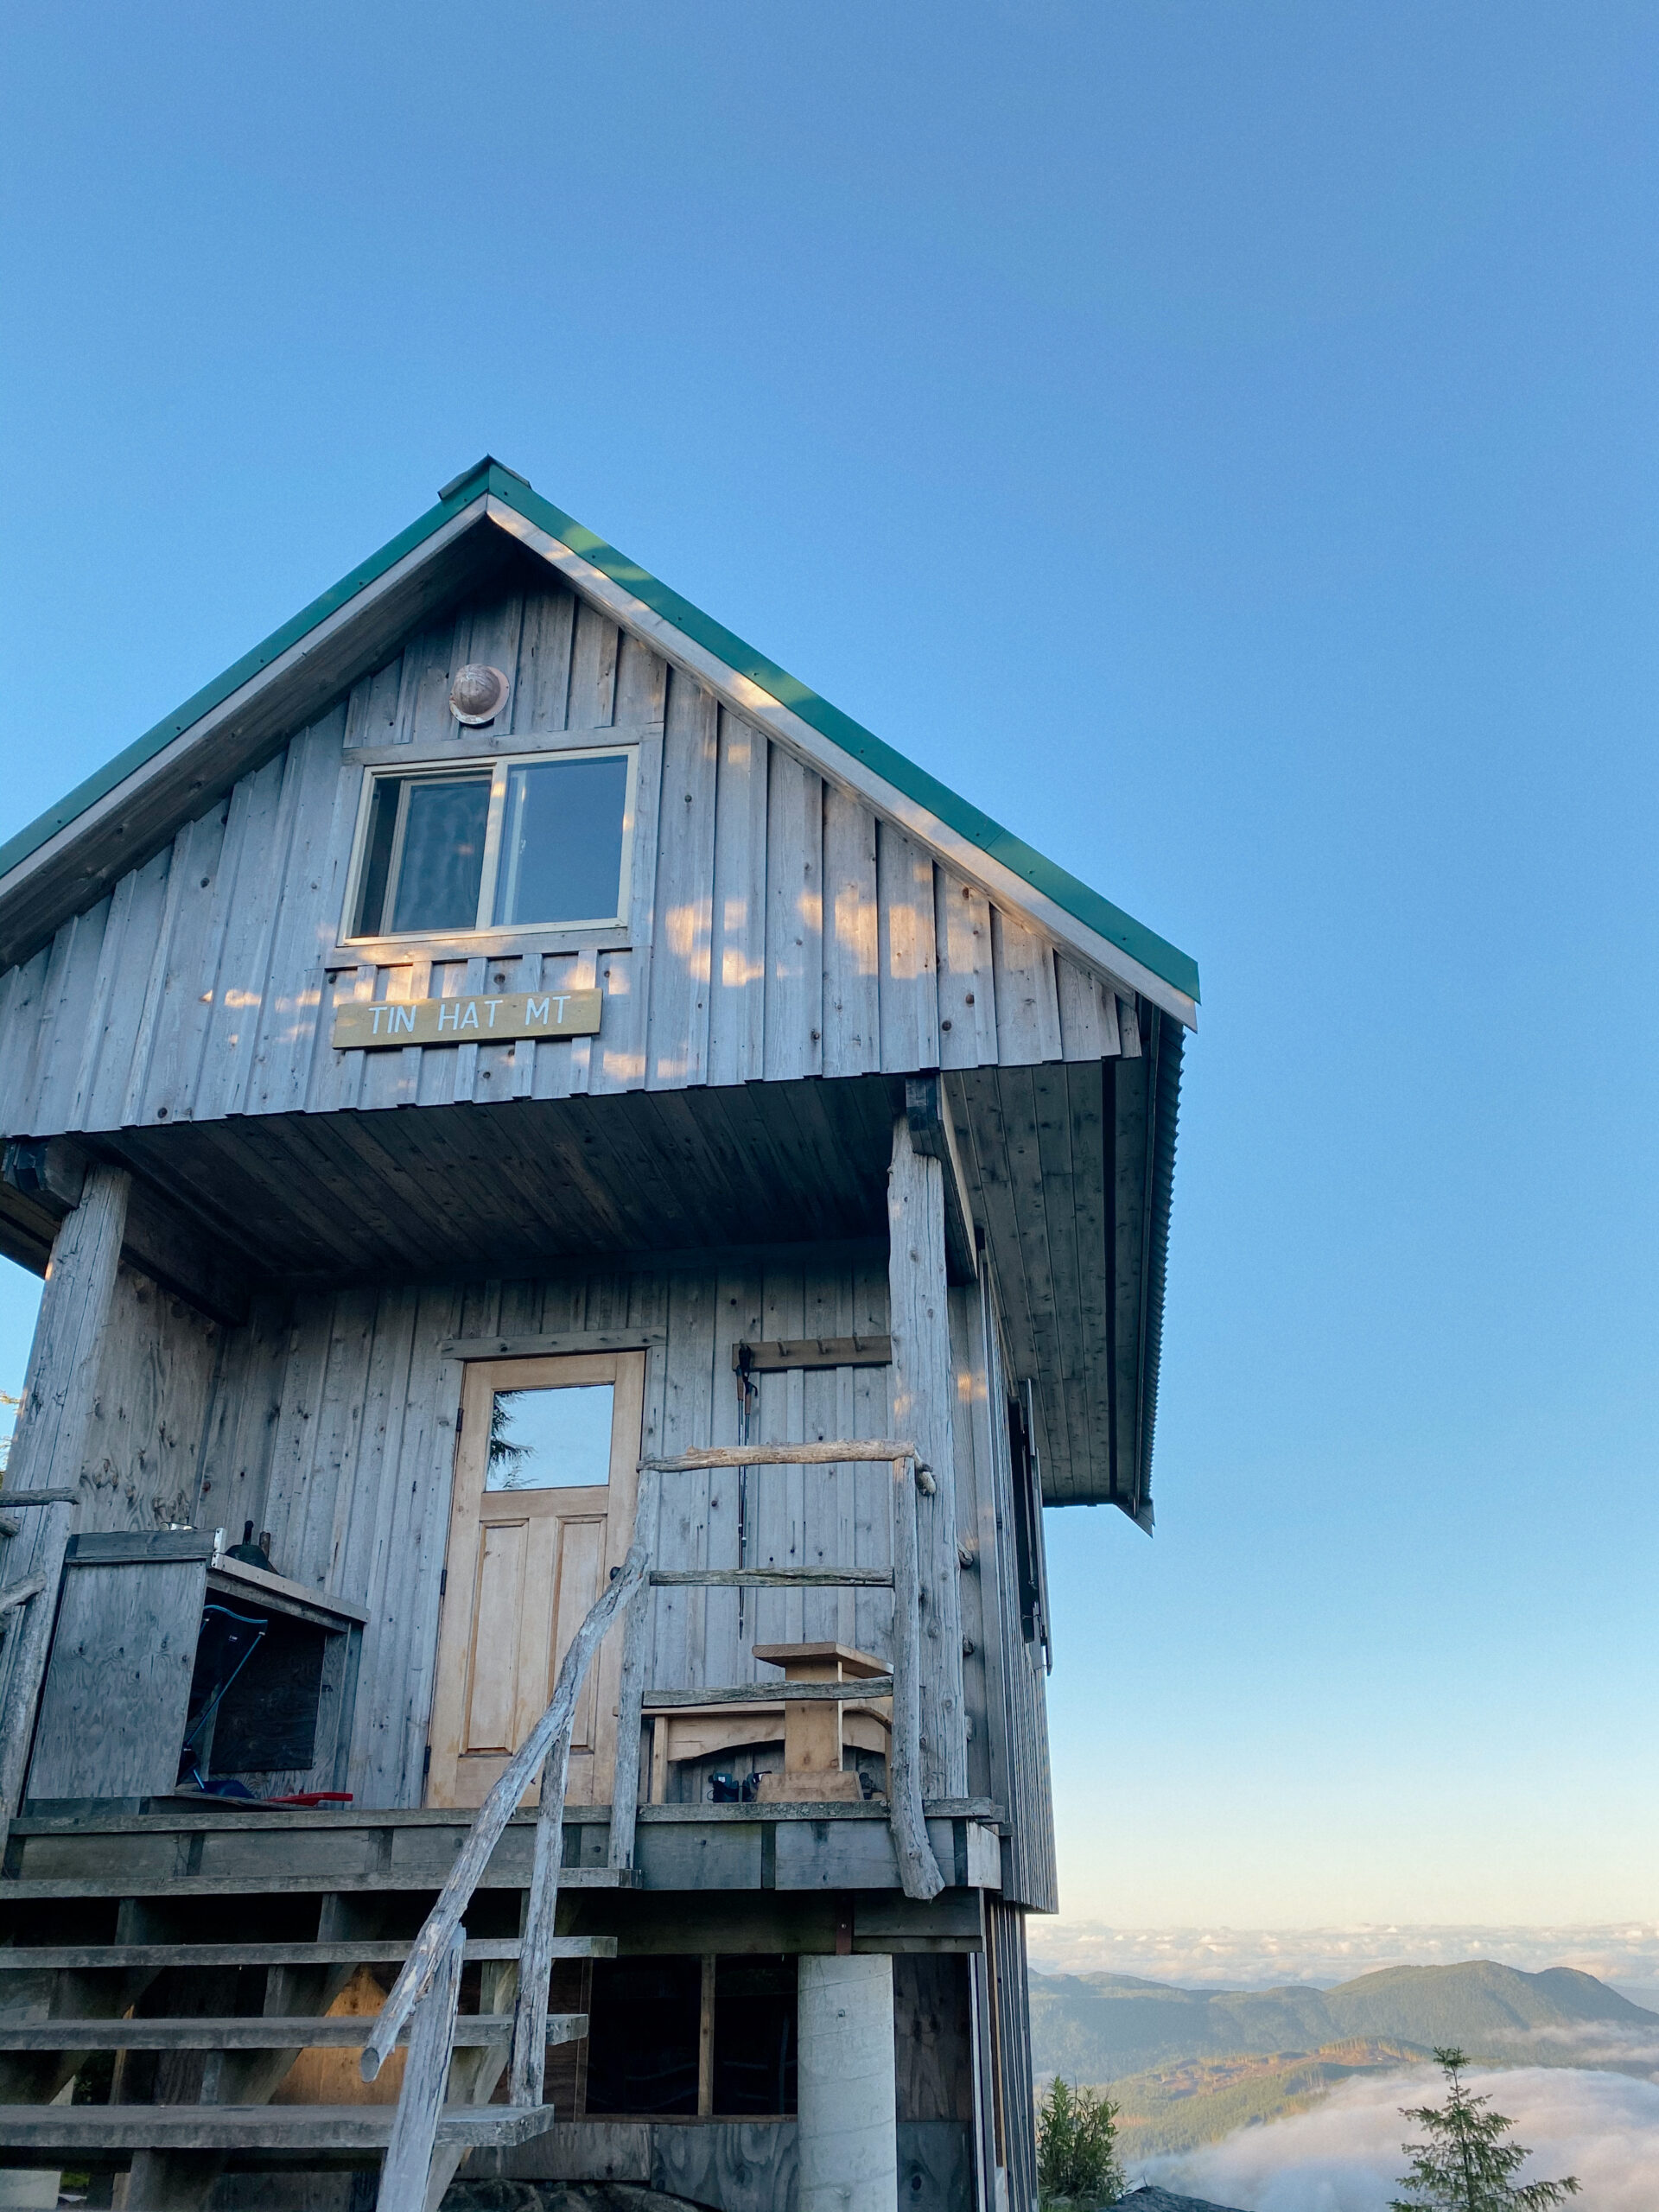 Tin Hat Hut on the Sunshine Coast trail